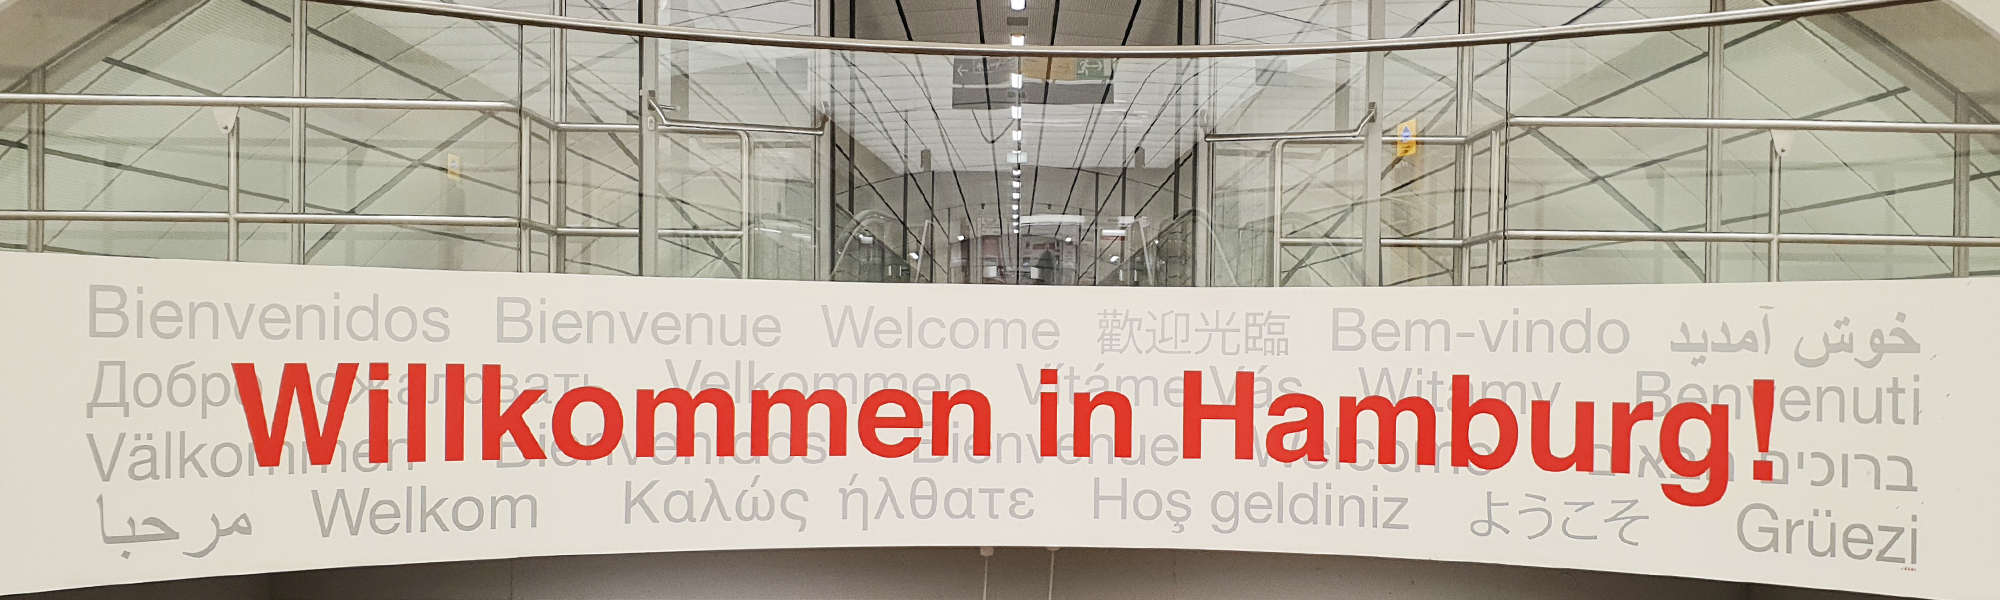 Hamburg Willkommen Flughafen | FollowMe Hamburg